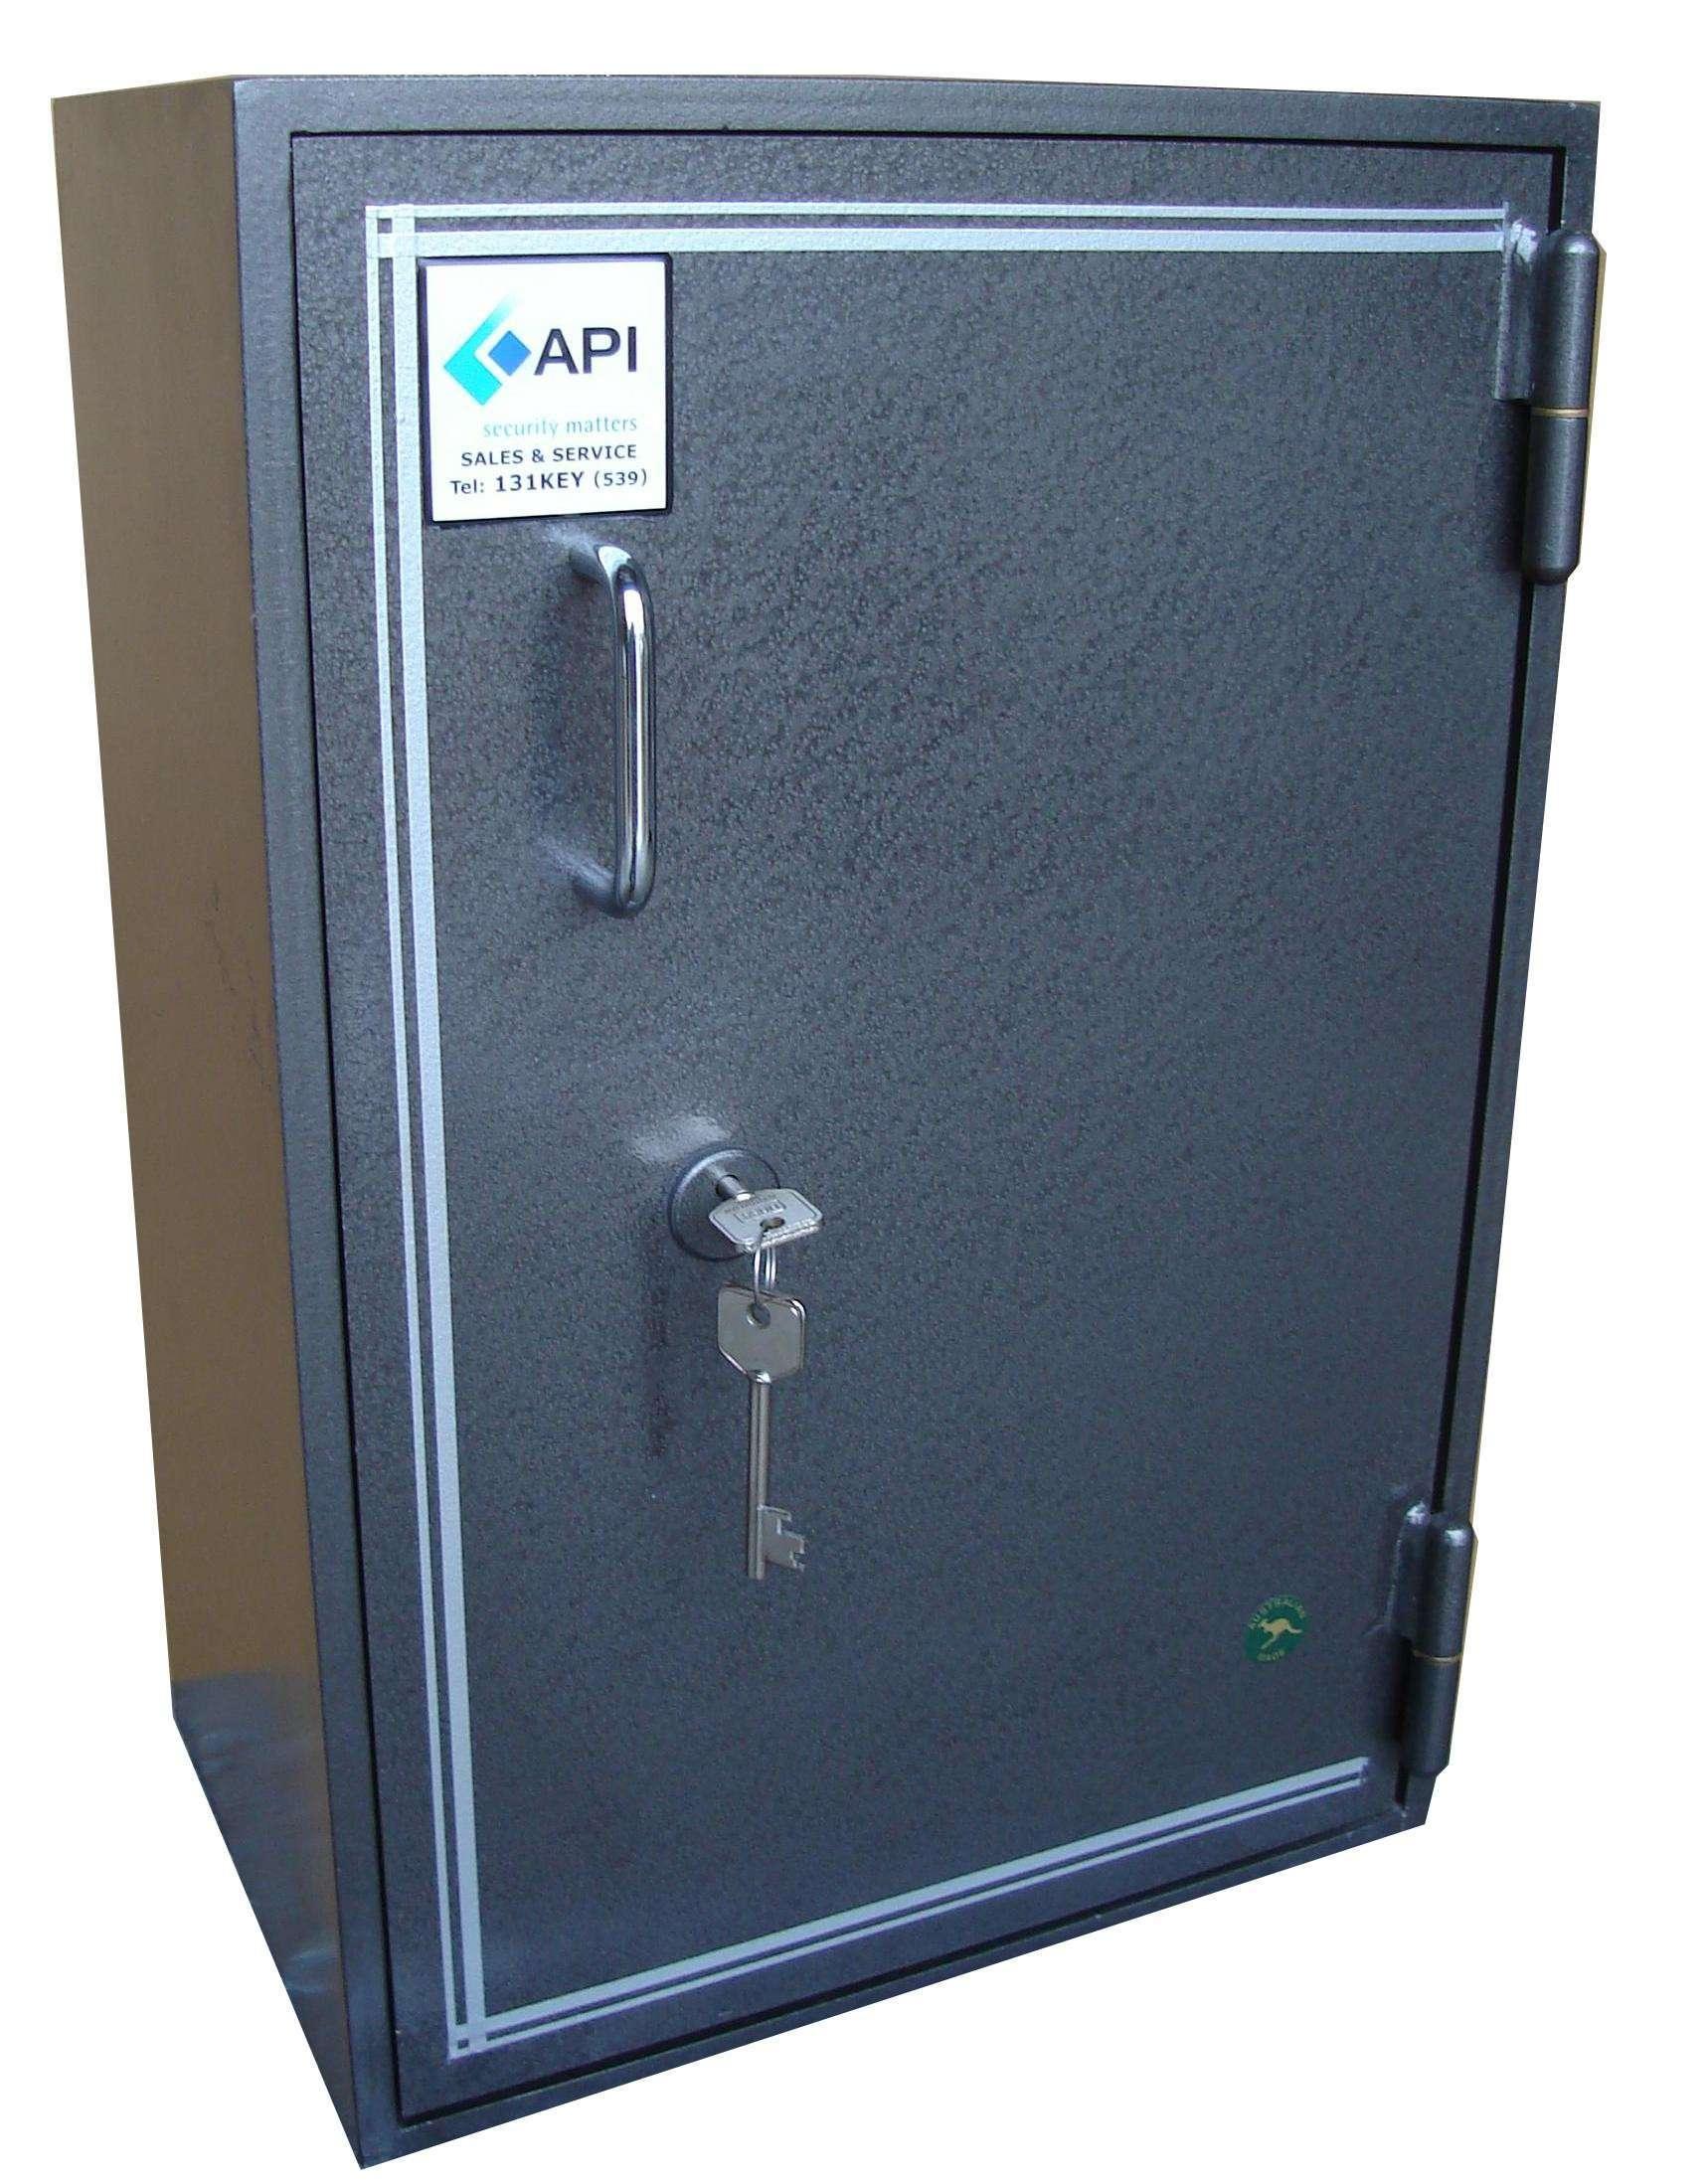 API Diplomat drug safe size 3